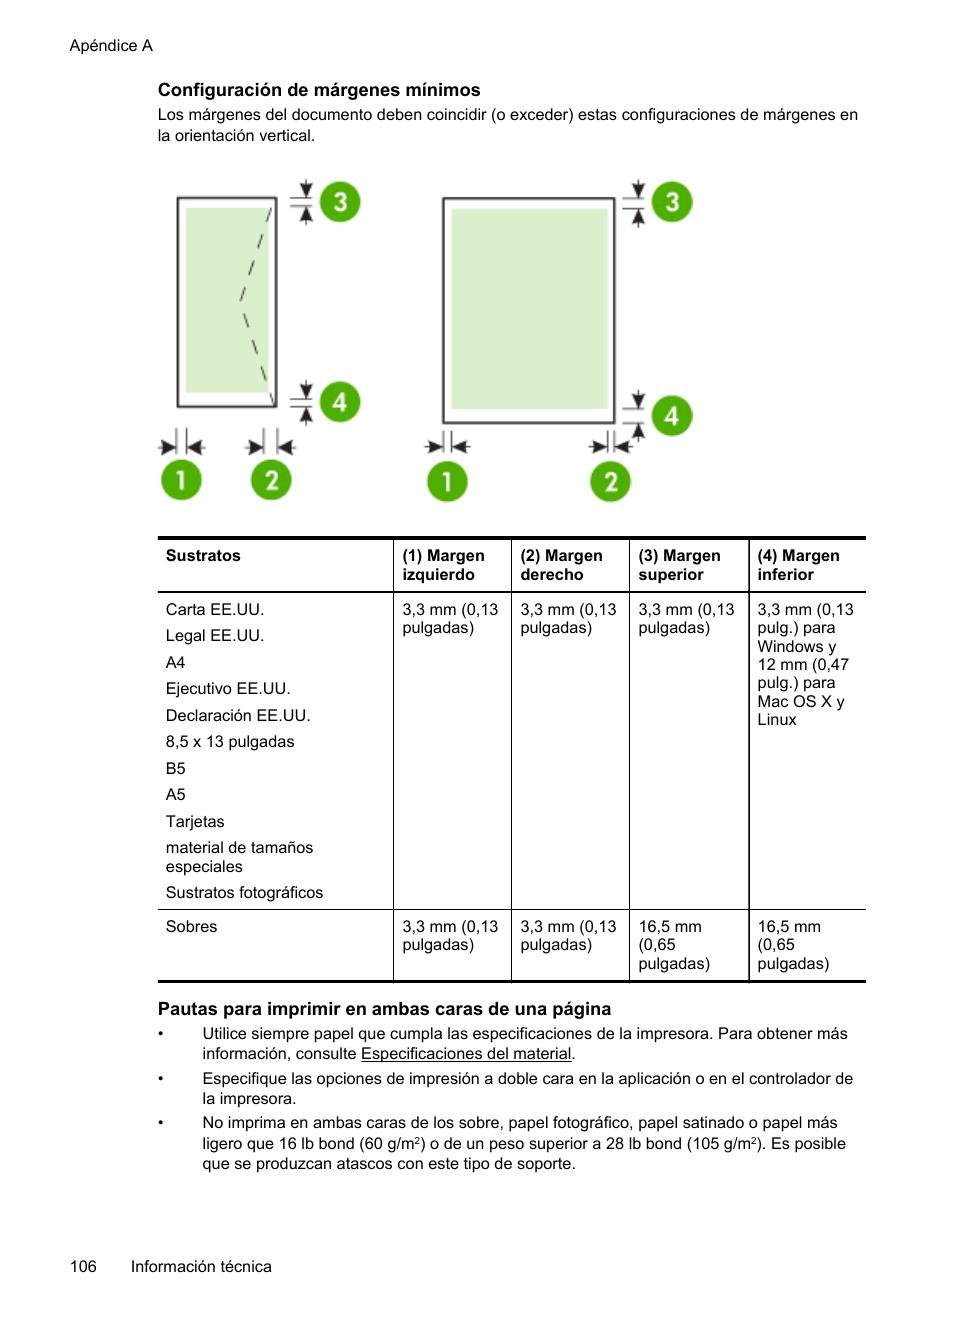 Configuración de márgenes mínimos   HP Impresora HP Officejet Pro 8100  ePrinter - N811a N811d Manual